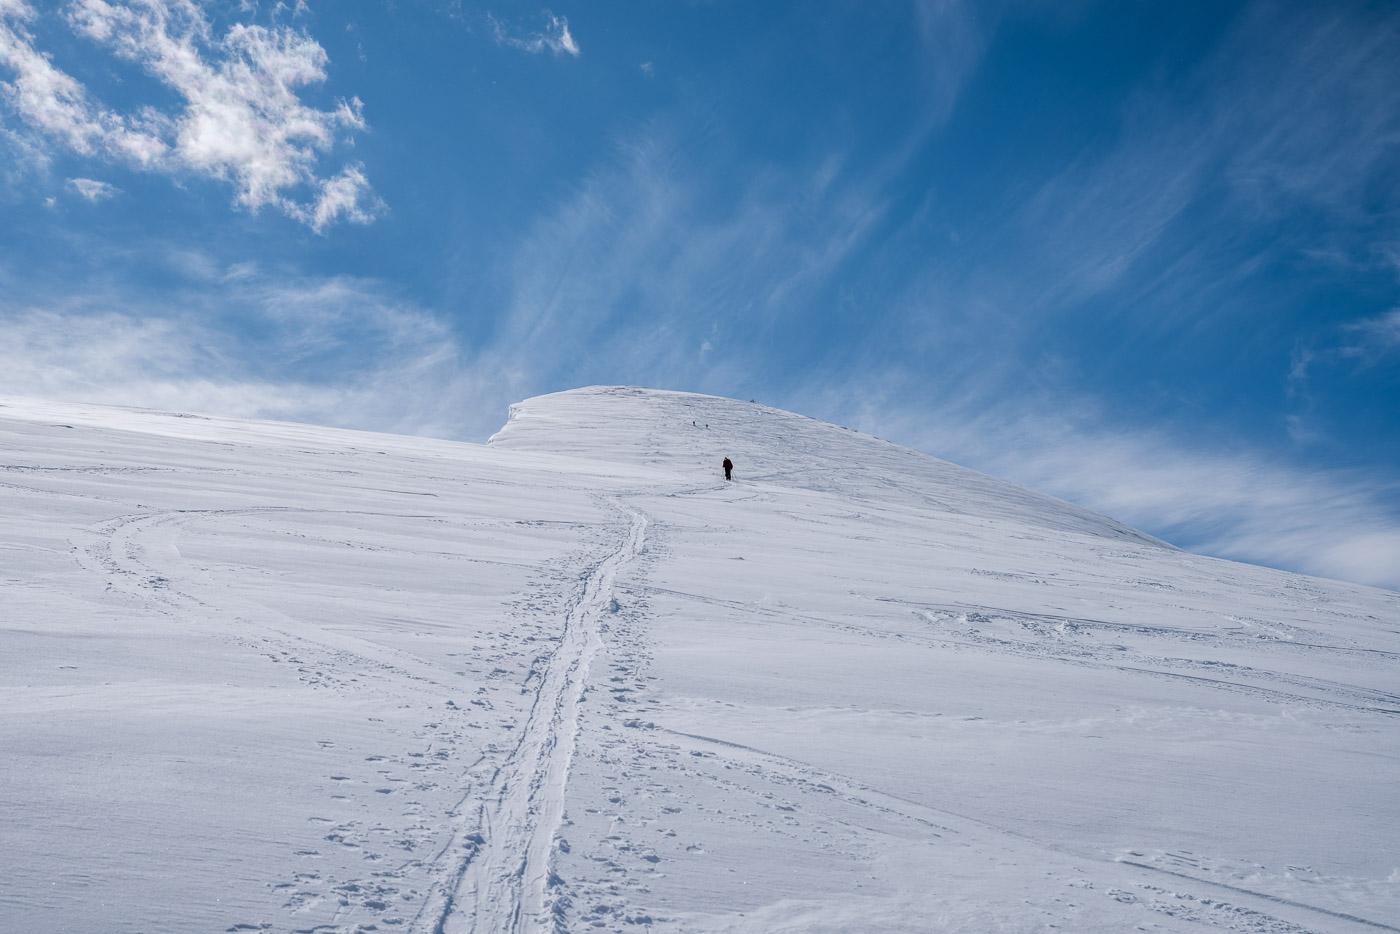 Noch 200 Höhenmeter zum Gipfel